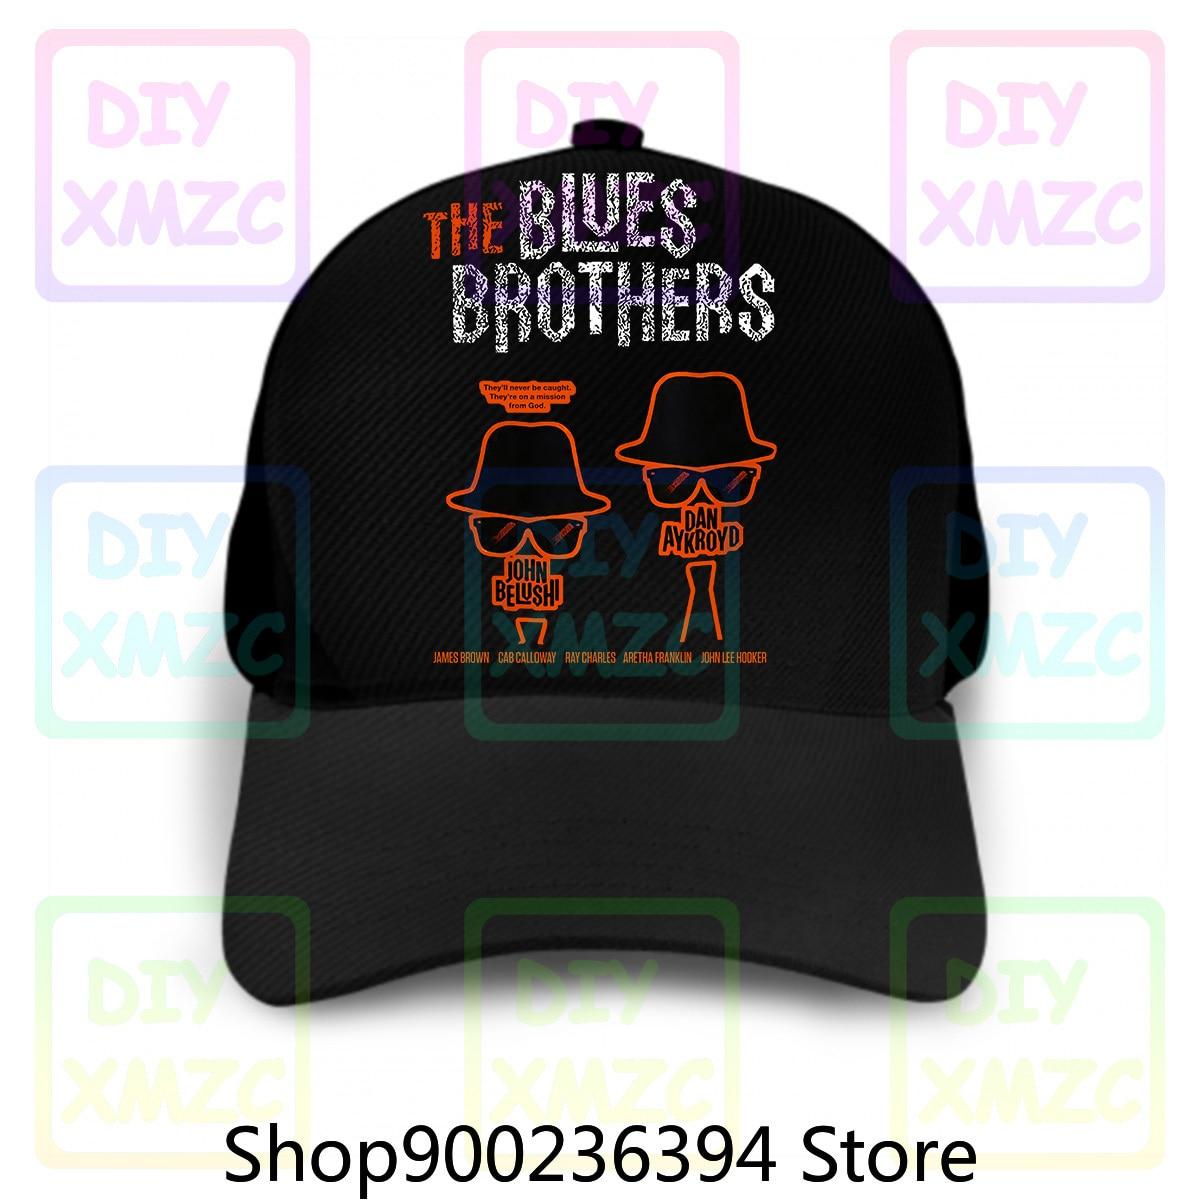 Gorra de béisbol Blues Brothers, gorra de hombre personalizada con música Jazz